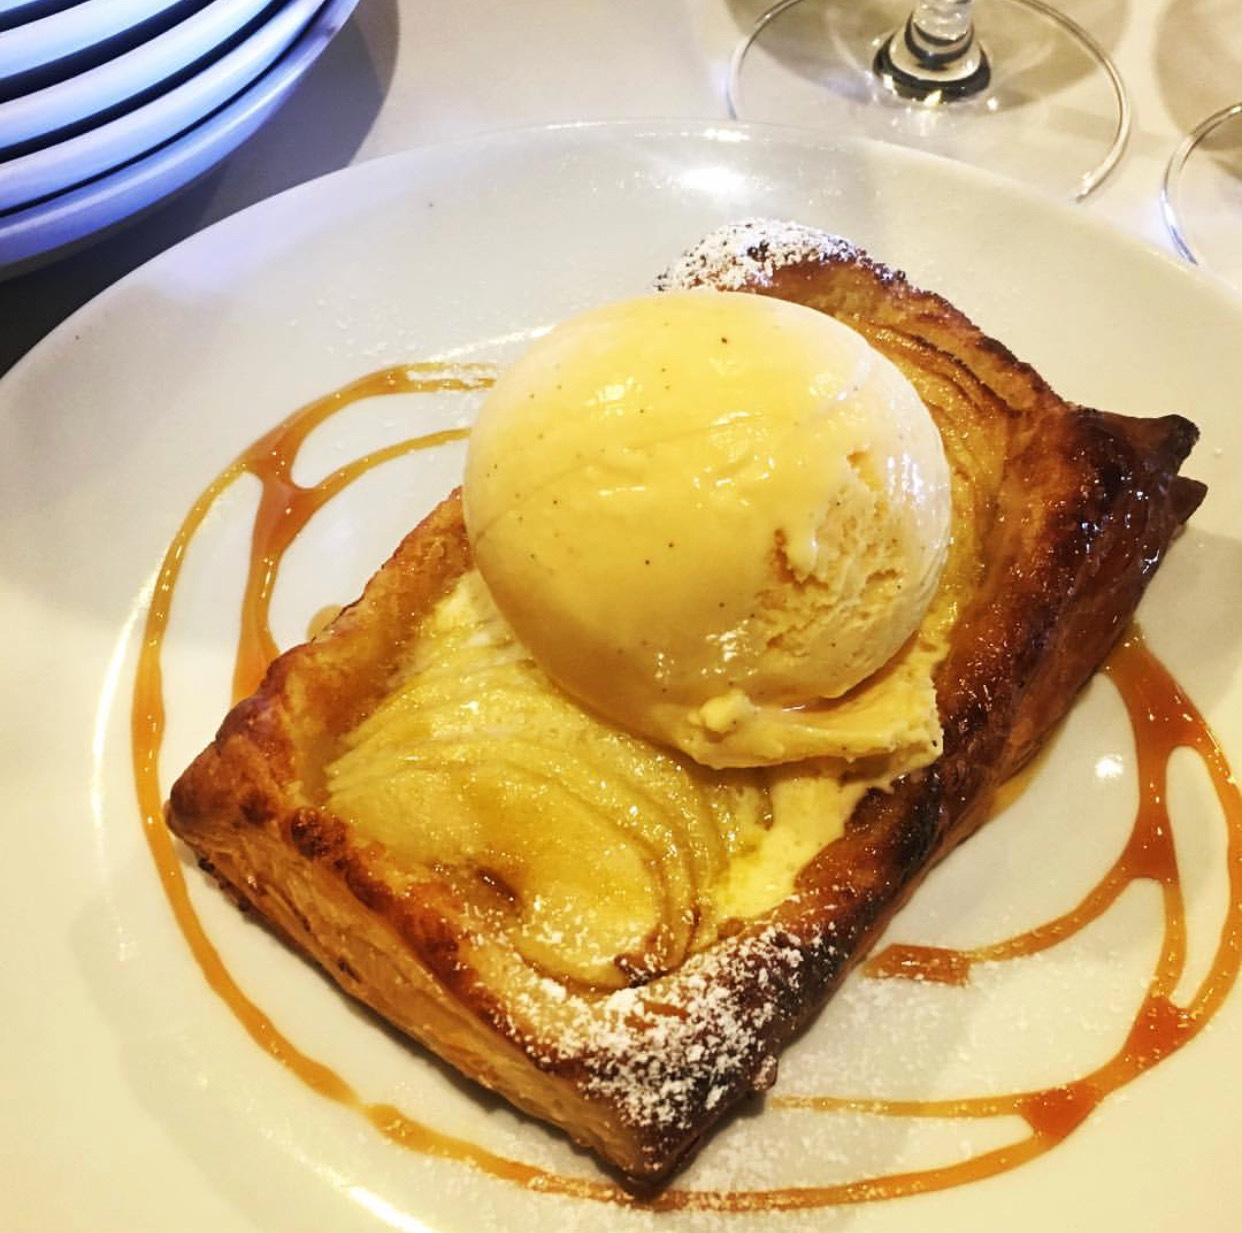 Baked Apple Flan frangipane, vanilla bean ice cream.  Image courtesy of Woodland Kitchen & Bar.